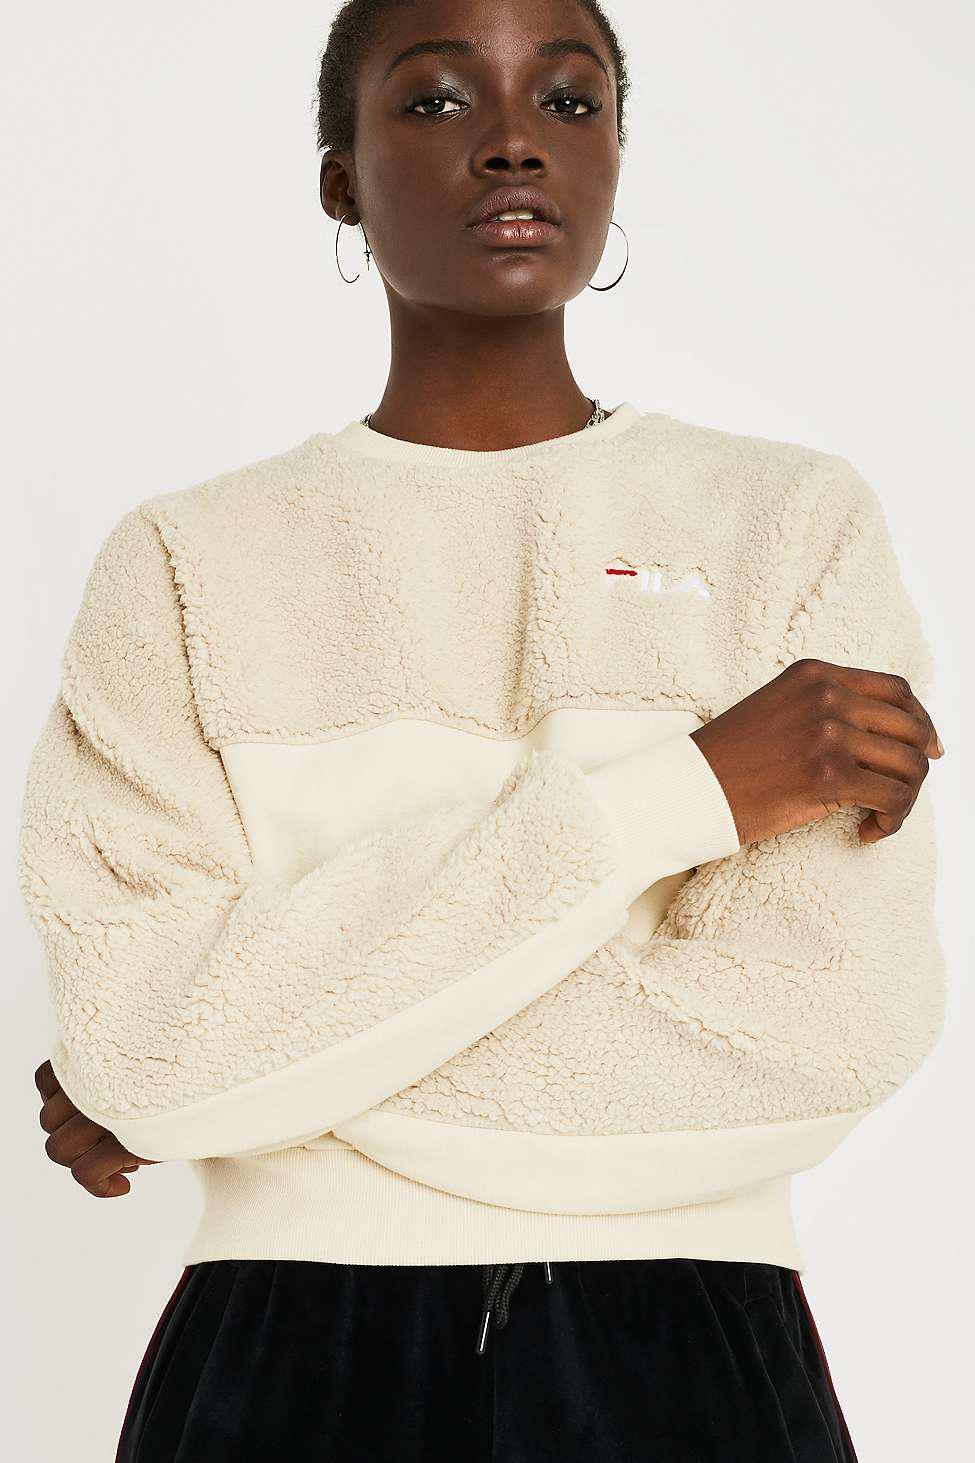 bfbd7cf5c1a Fila Cia Cream Fleece Crew Neck Sweatshirt - Womens Xs in White - Lyst